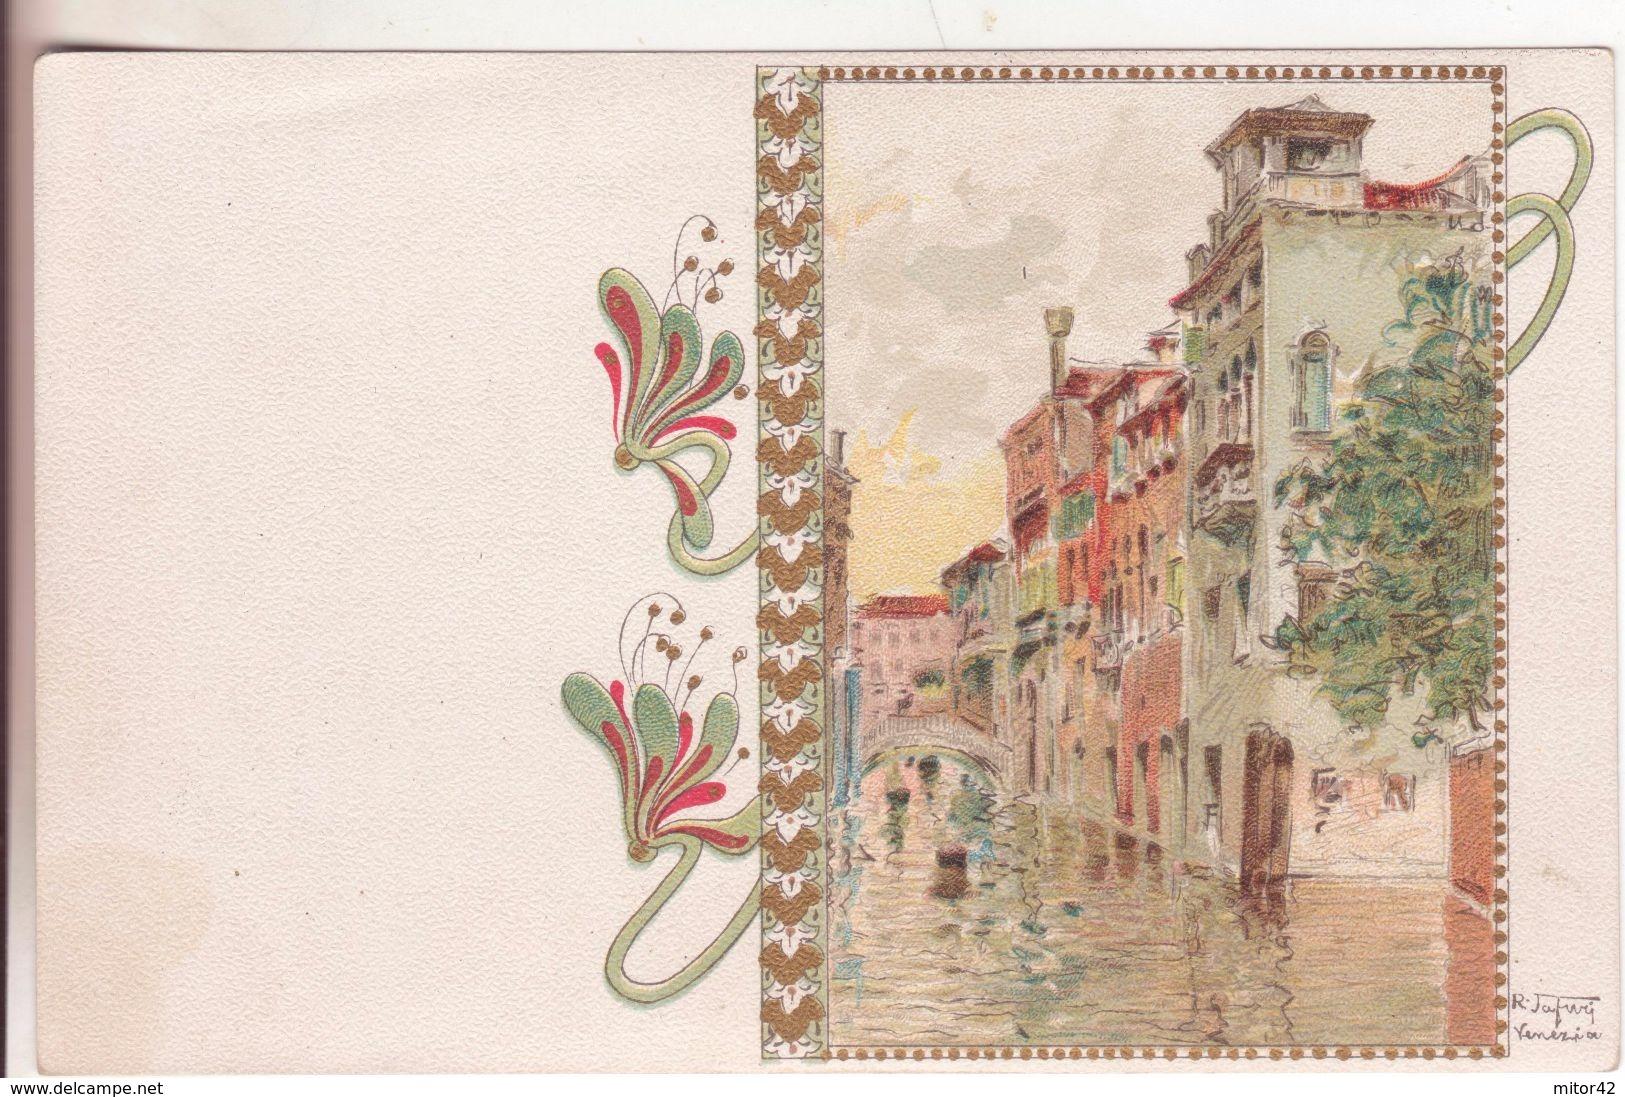 177-Illustratori-Cartolina Firmata R.Tafuri-Venezia-Veneto-Liberty-Nuova-Nouveau-New - Illustrateurs & Photographes